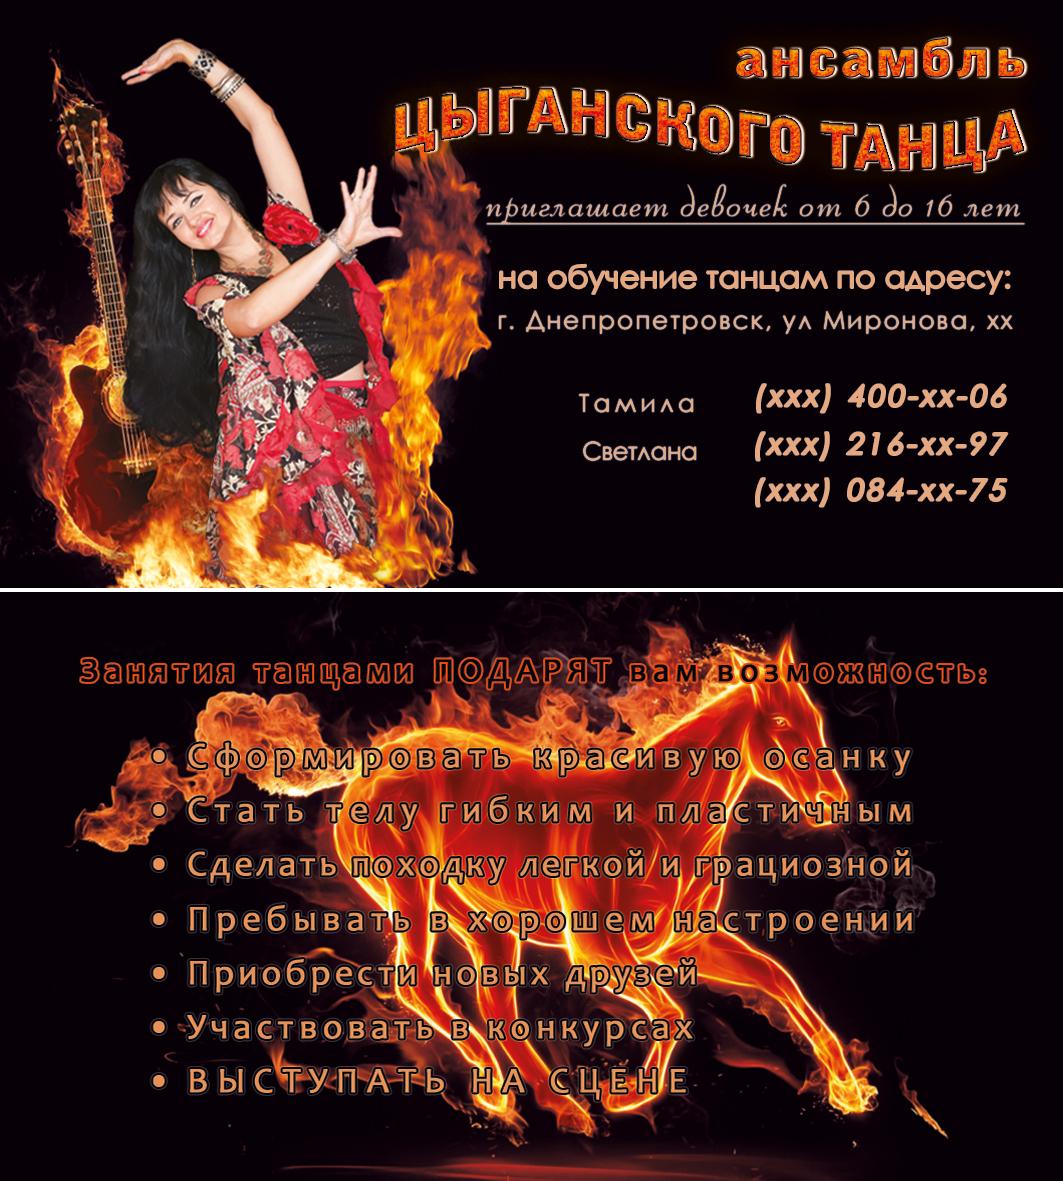 Визитка двухсторонняя - Школы цыганских танцев